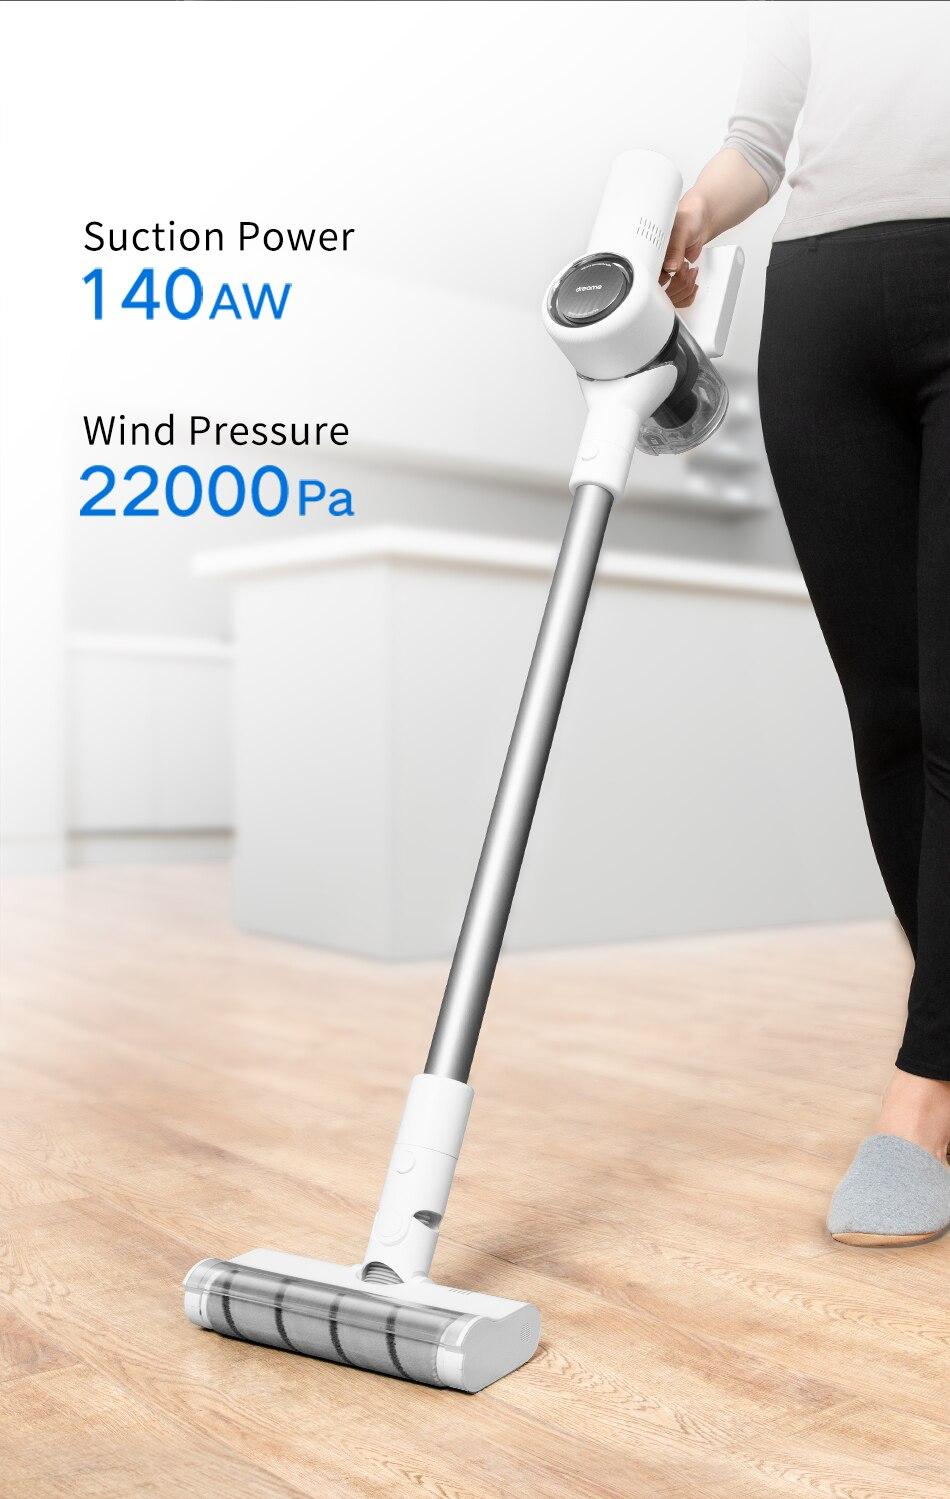 Dreame V10 Wireless Vacuum Cleaner